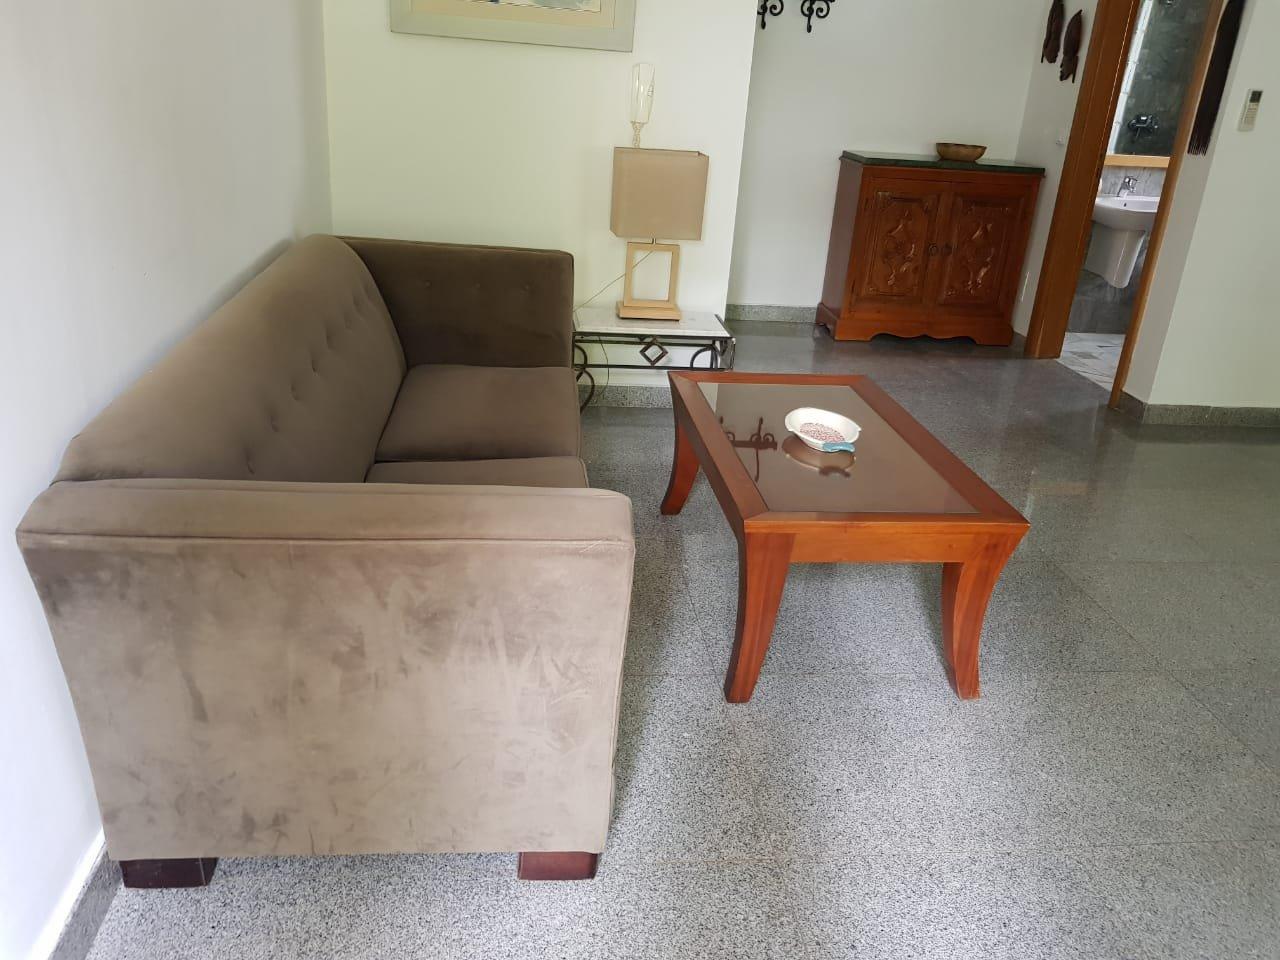 Location Appartement - La Soukra - Tunisie